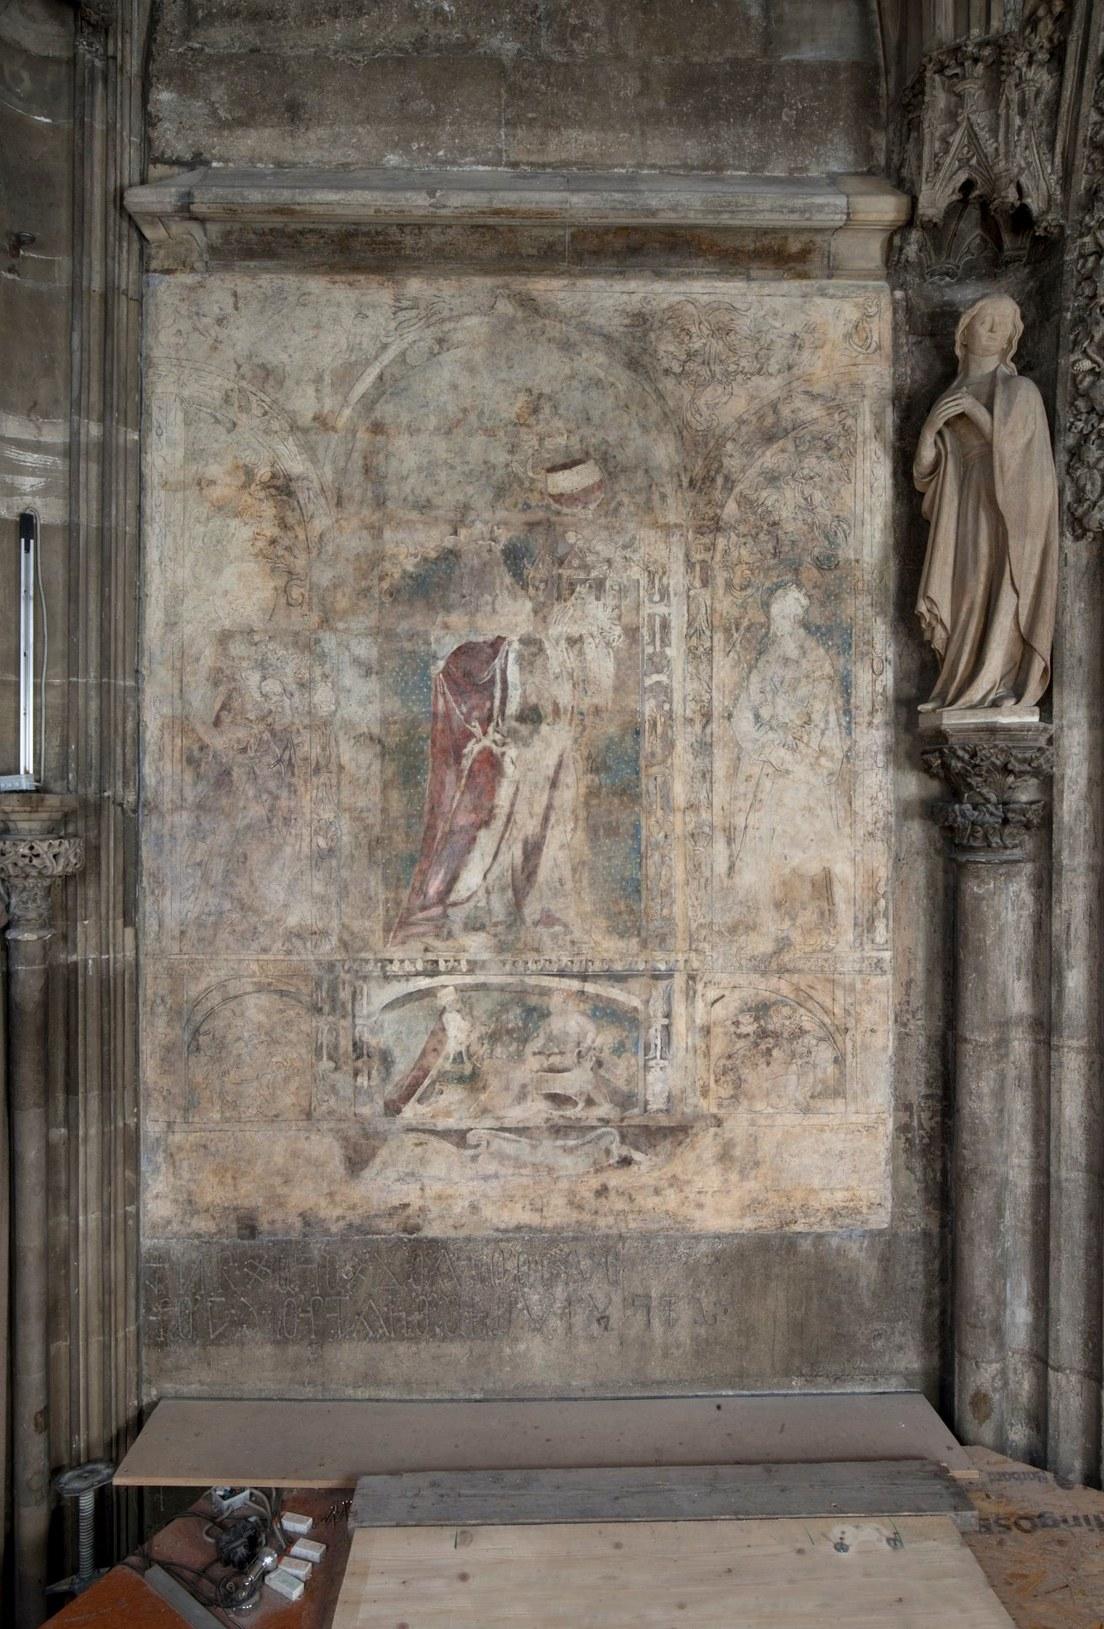 5e1ea6be59bf5b14285f67f7 Fotografias: Descubren en una catedral de Austria una pintura renacentista que podría ser una obra perdida de Alberto Durero